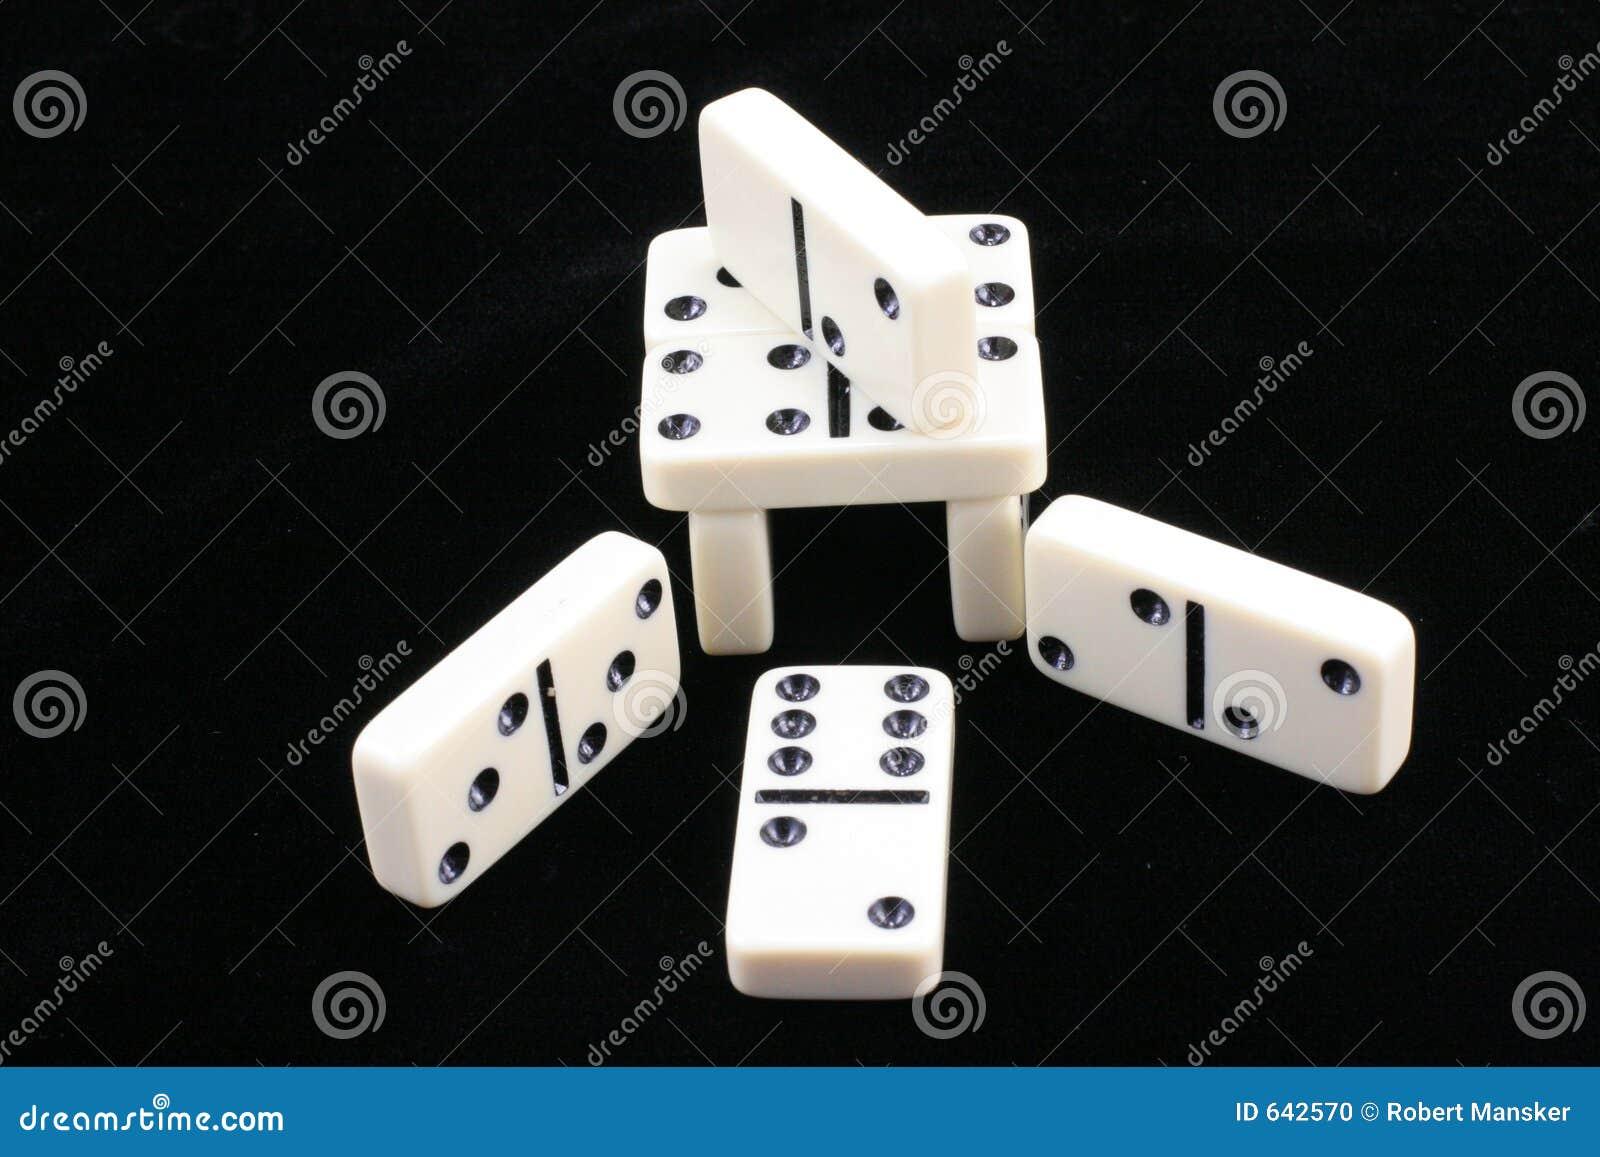 Domino stack